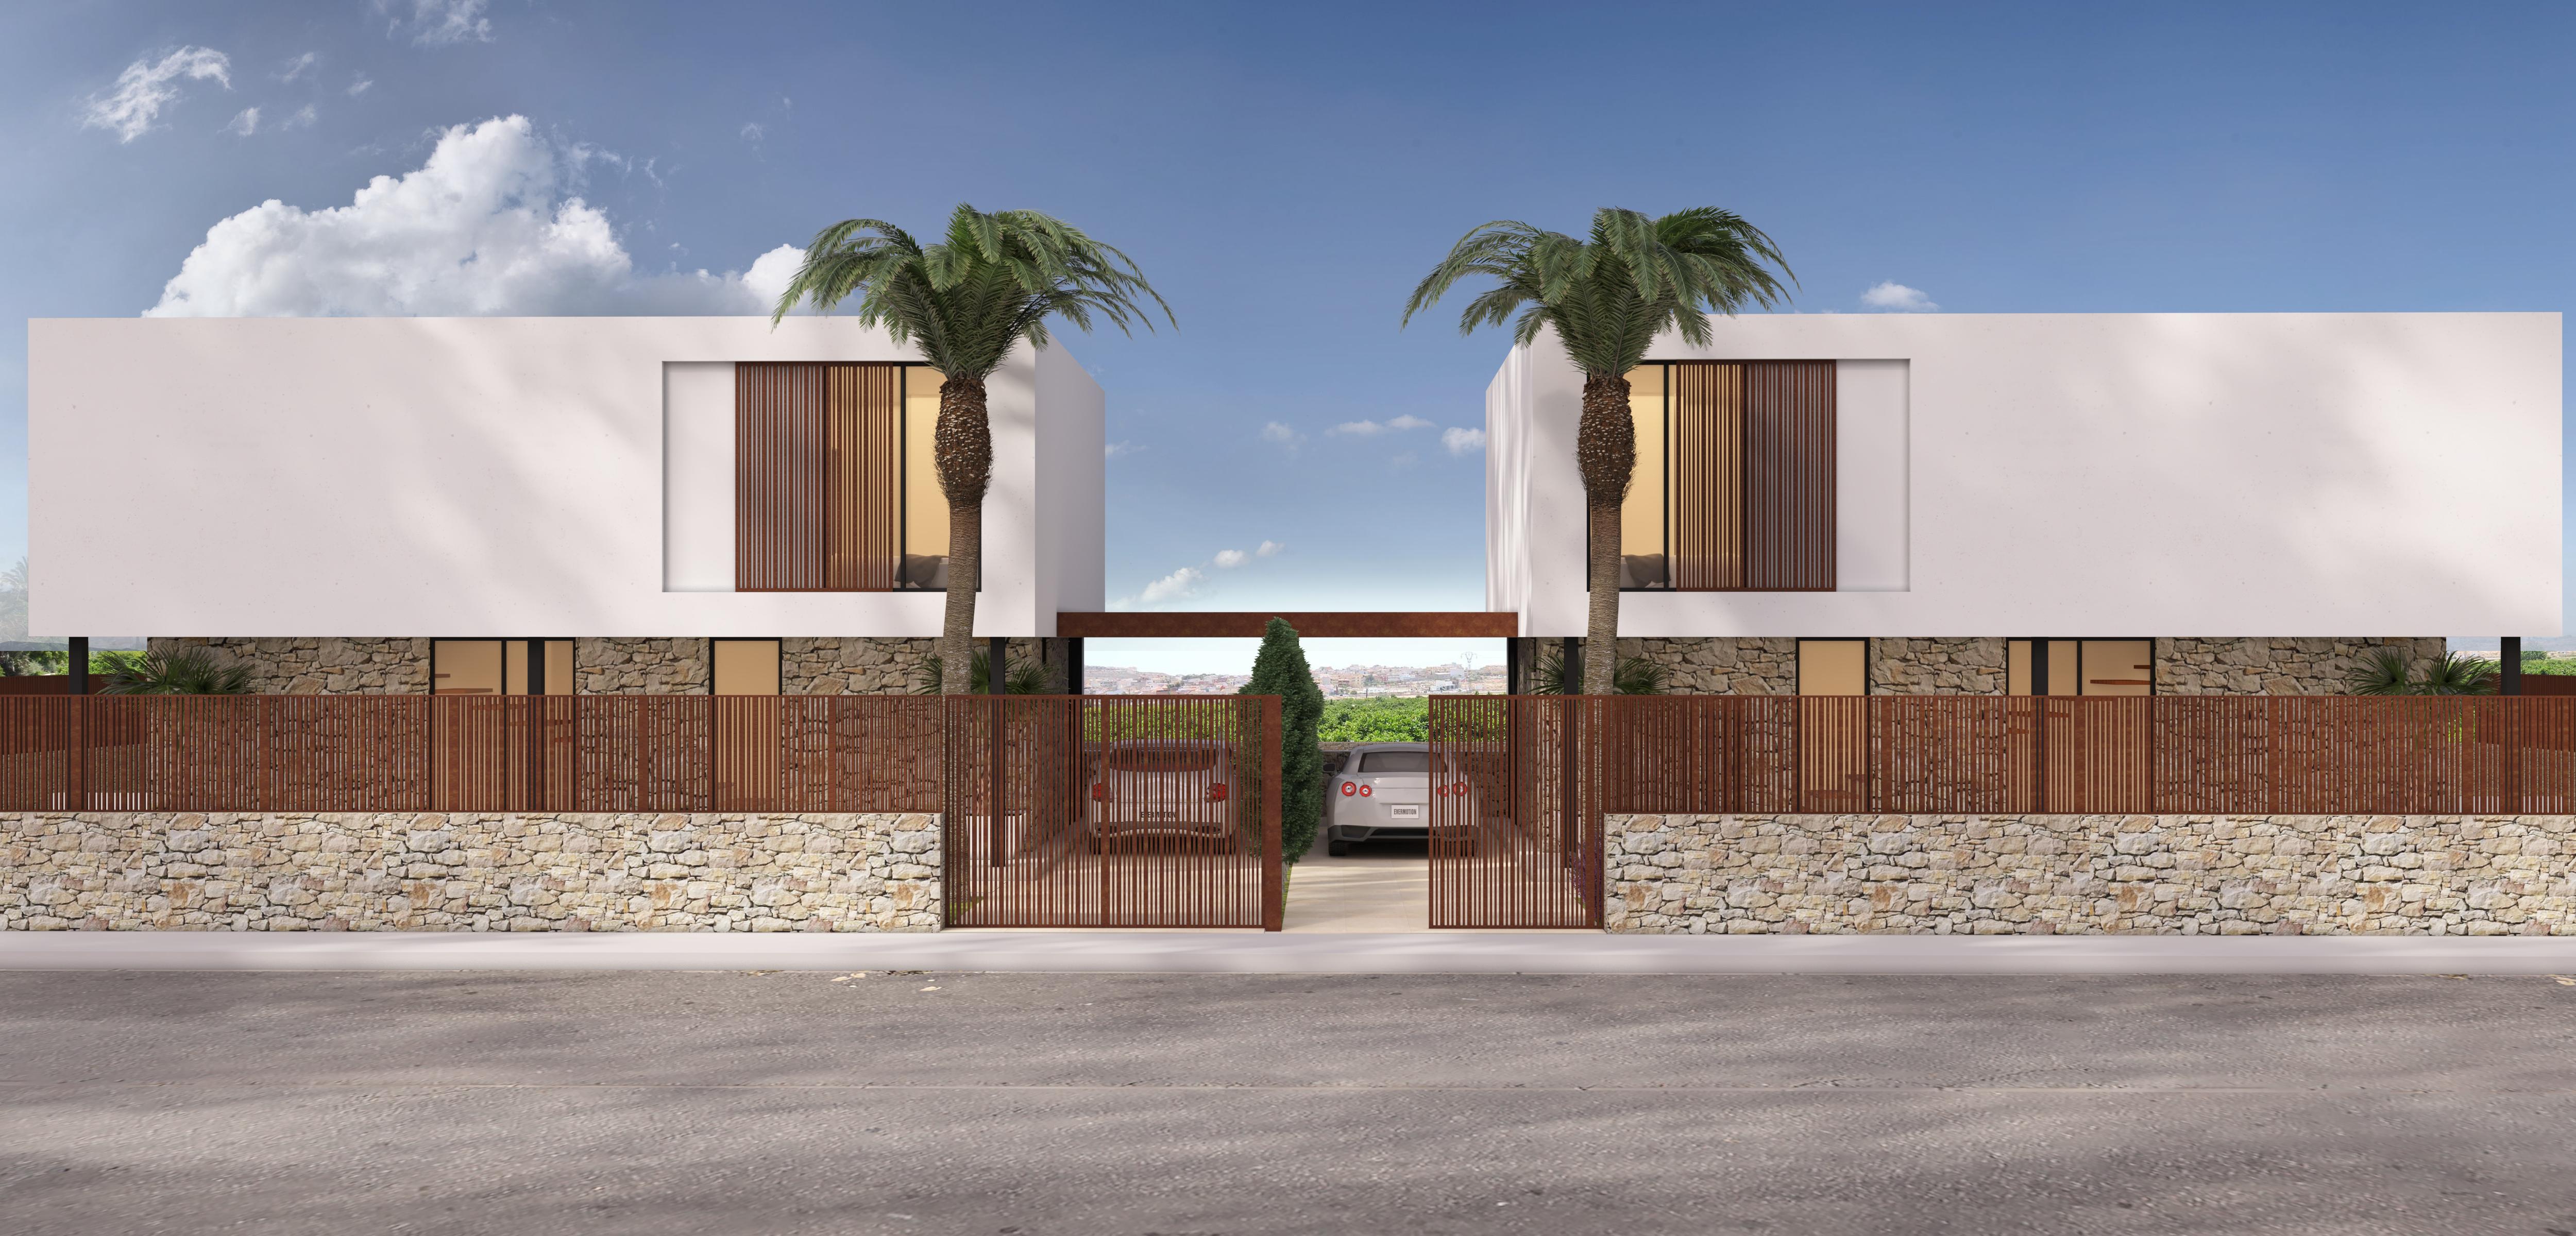 Exclusive villa in Benijofar with 5 beds/4baths